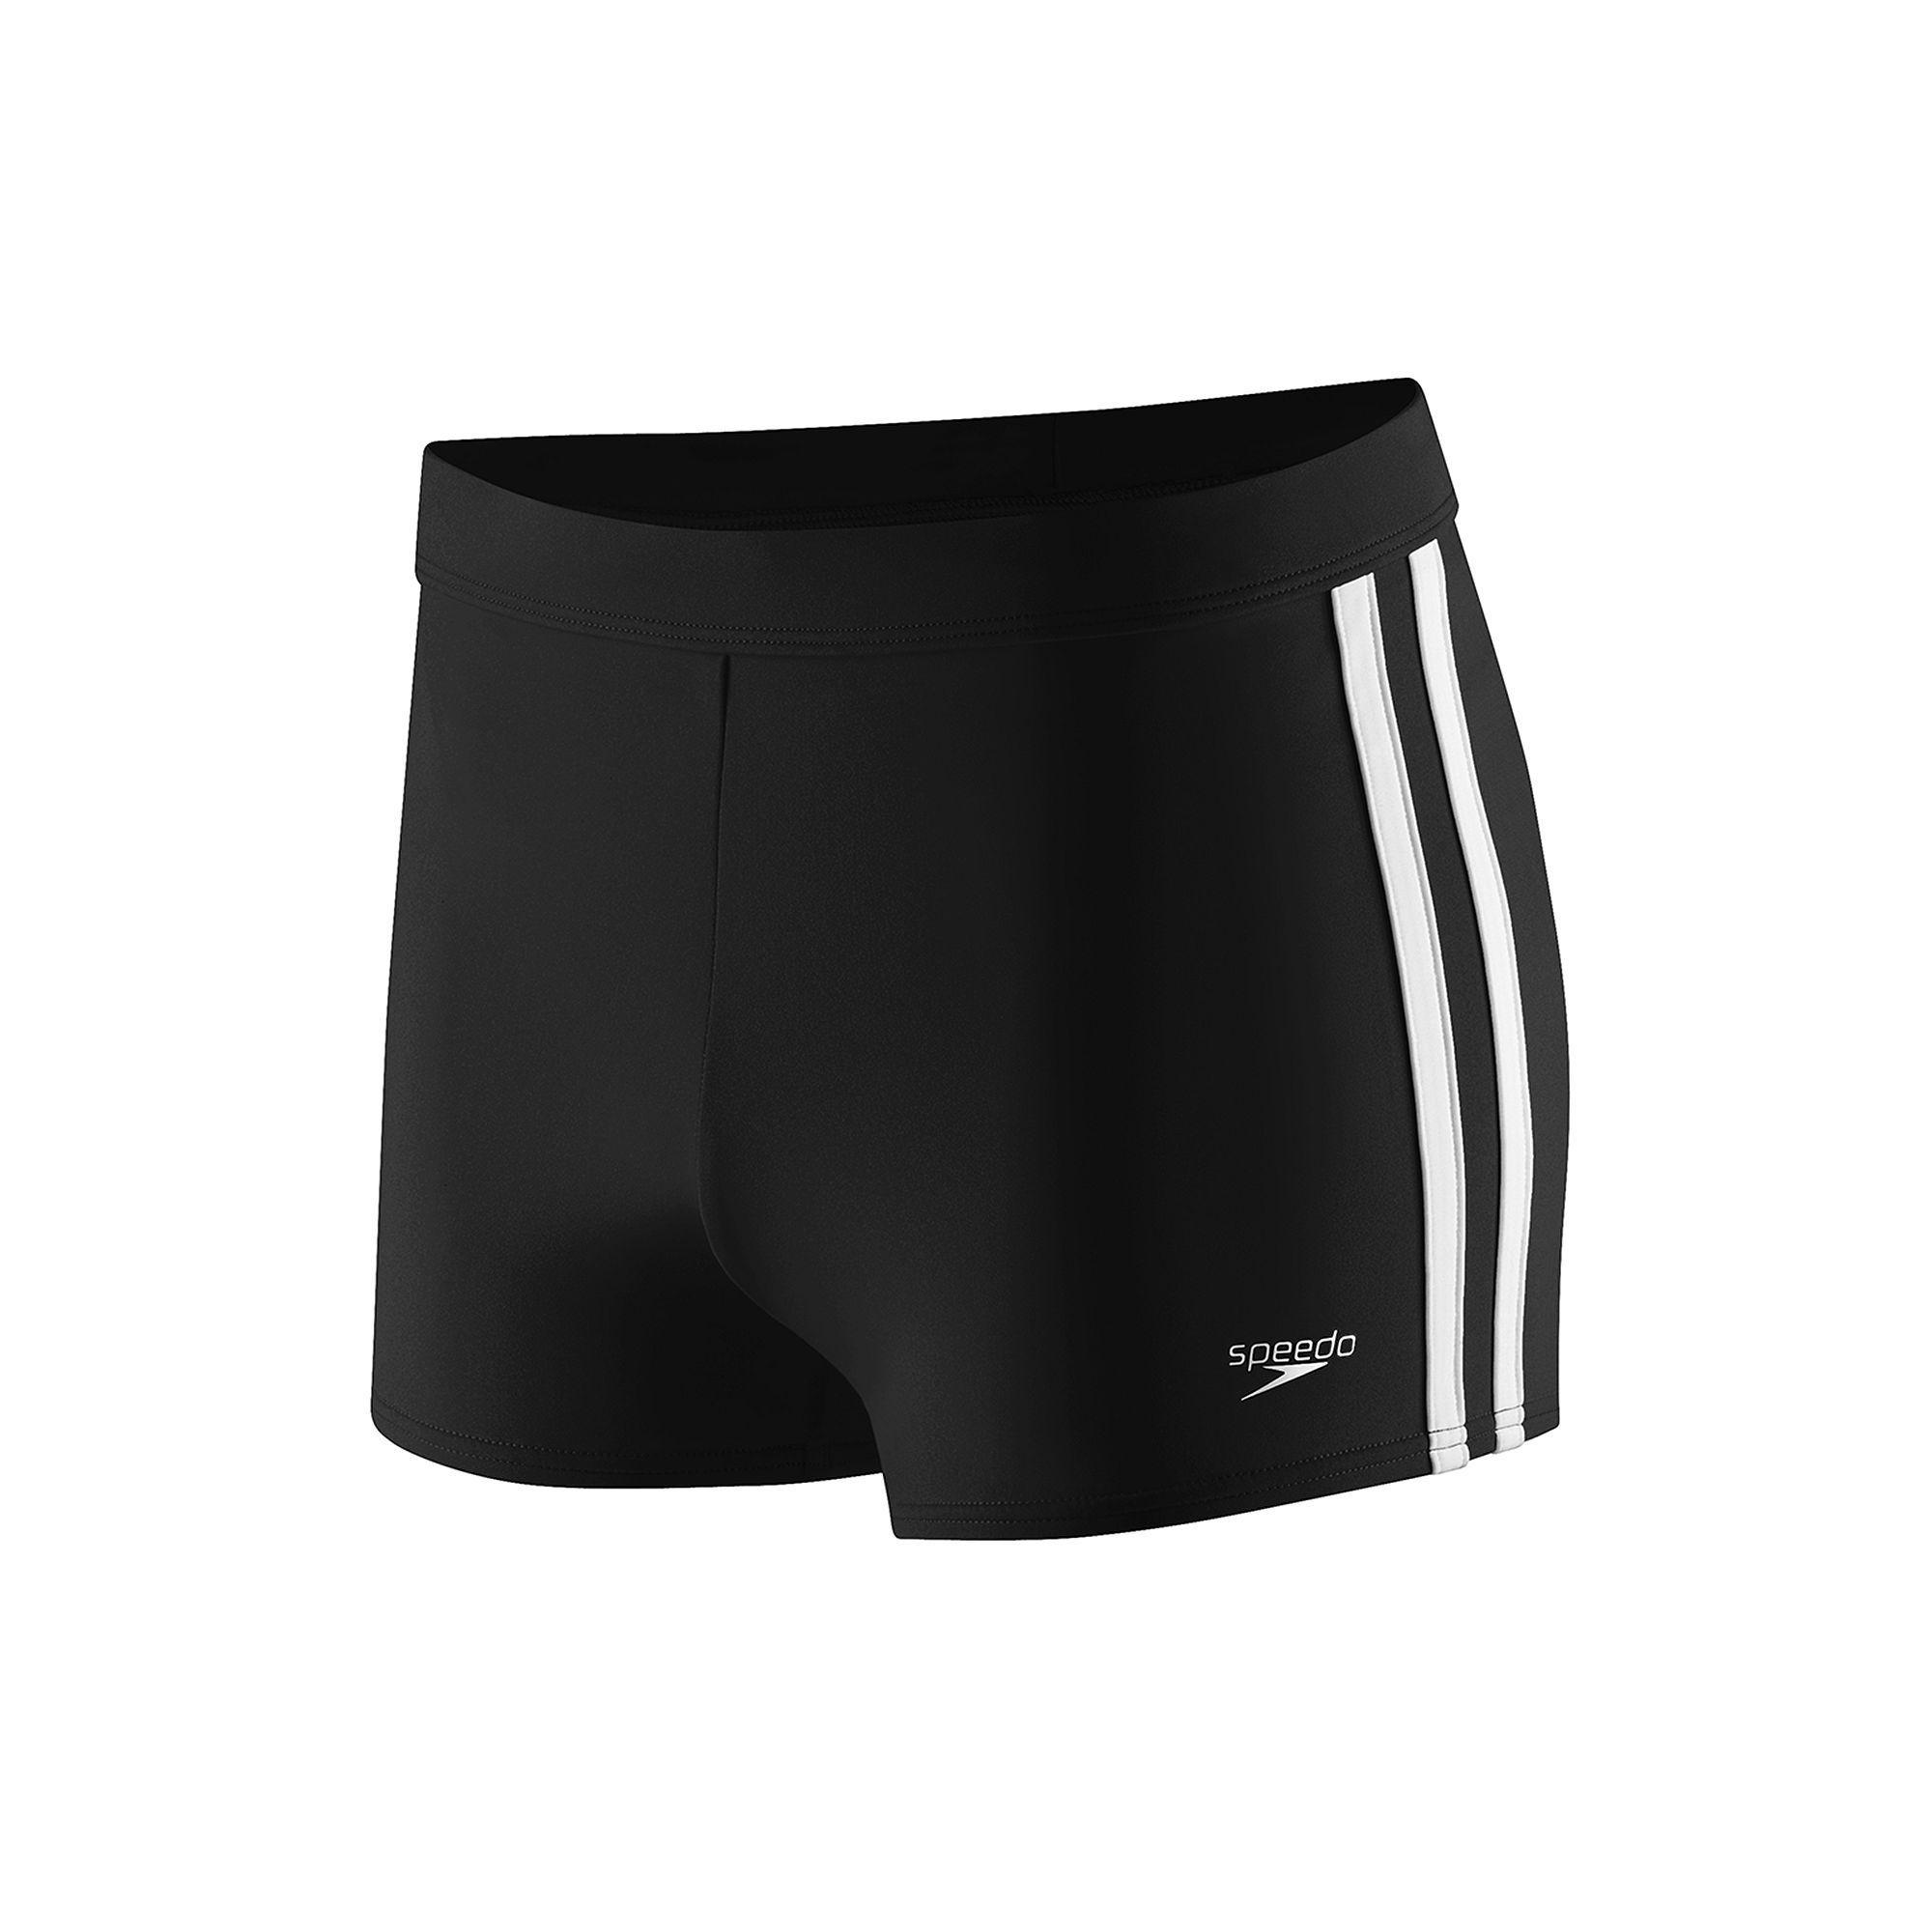 234d5f3e22 Speedo Shoreline Square Leg Side-Striped Athletic Swim Shorts - Men, Size:  Medium, Black